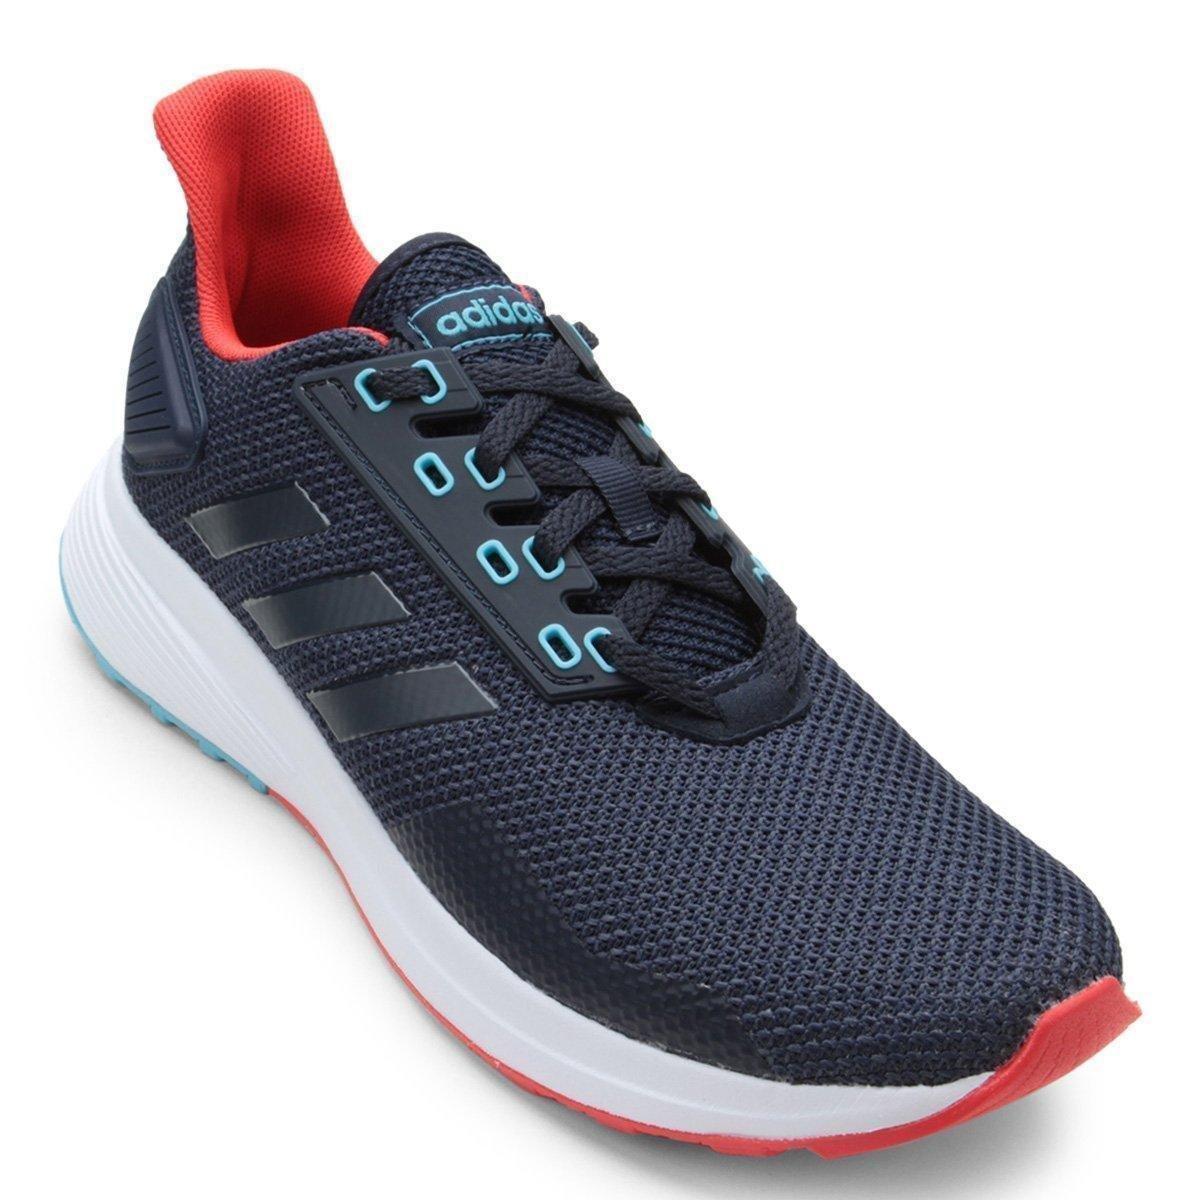 Duramo Adidas 9 Tênis Feminino Azul 9 Adidas Tênis Duramo dwxFIqdHz